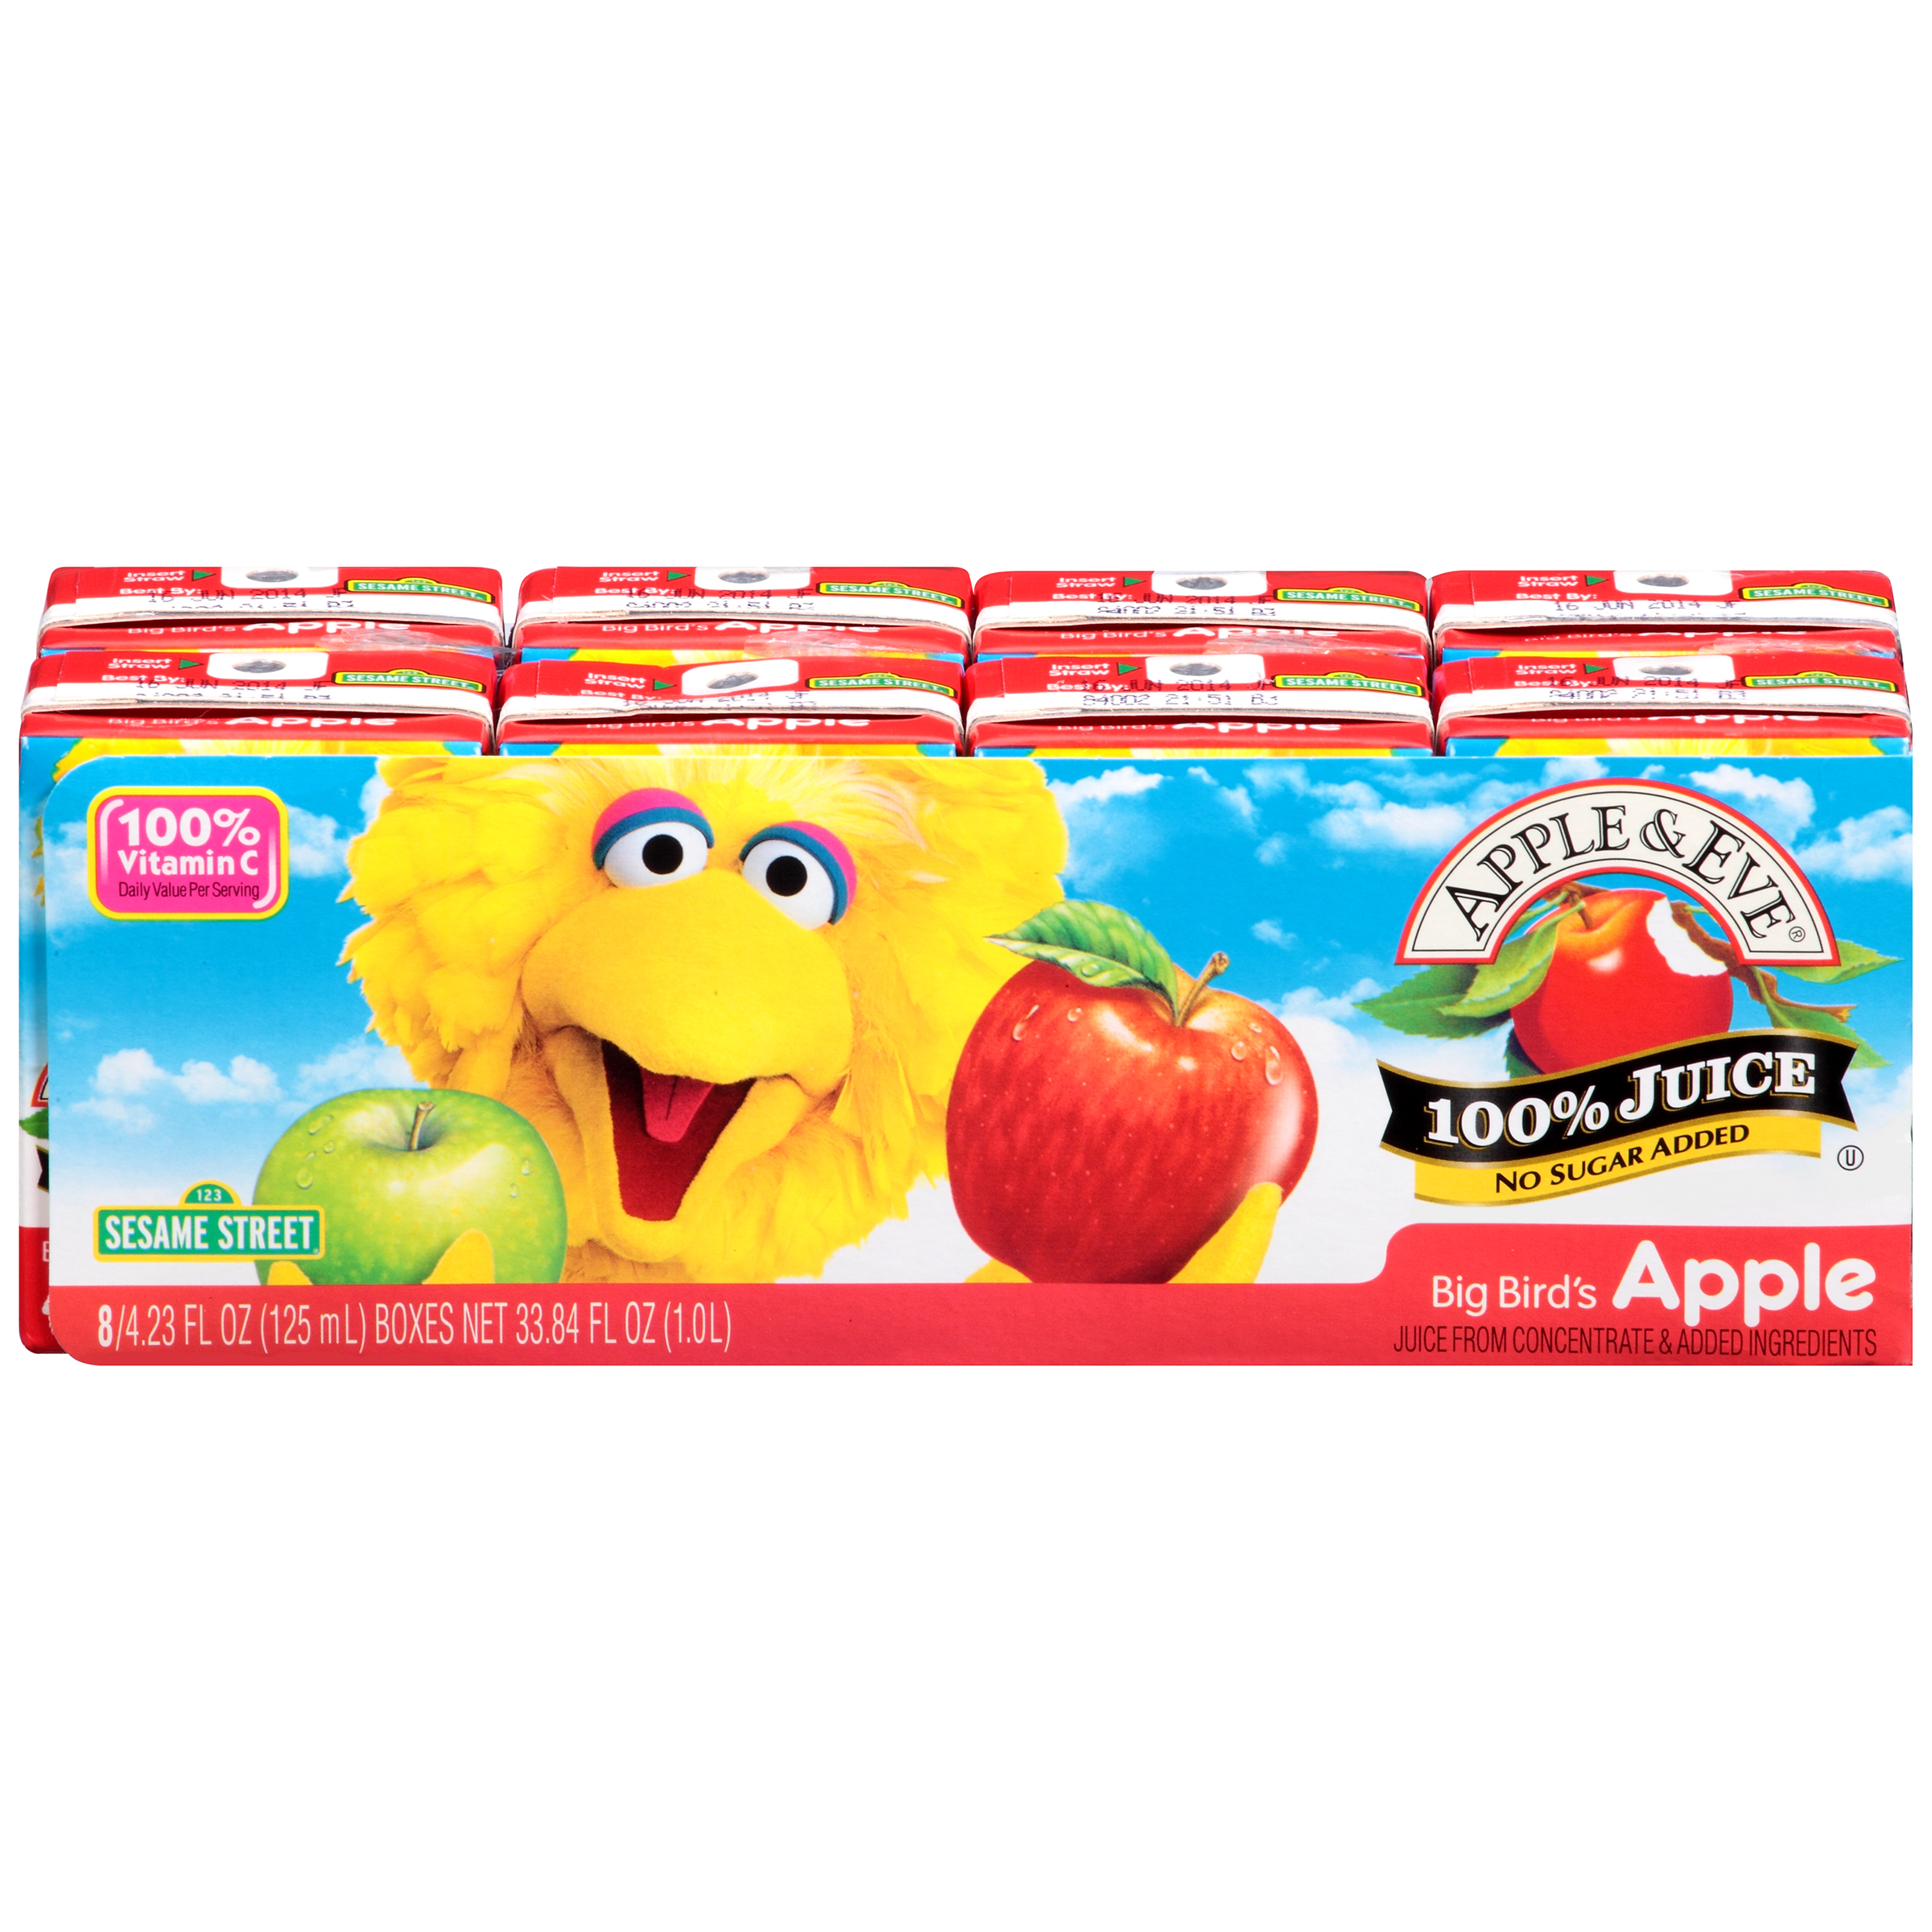 Apple & Eve Sesame Street 100% Juice, Apple, 4.23 Fl Oz, 8 Count